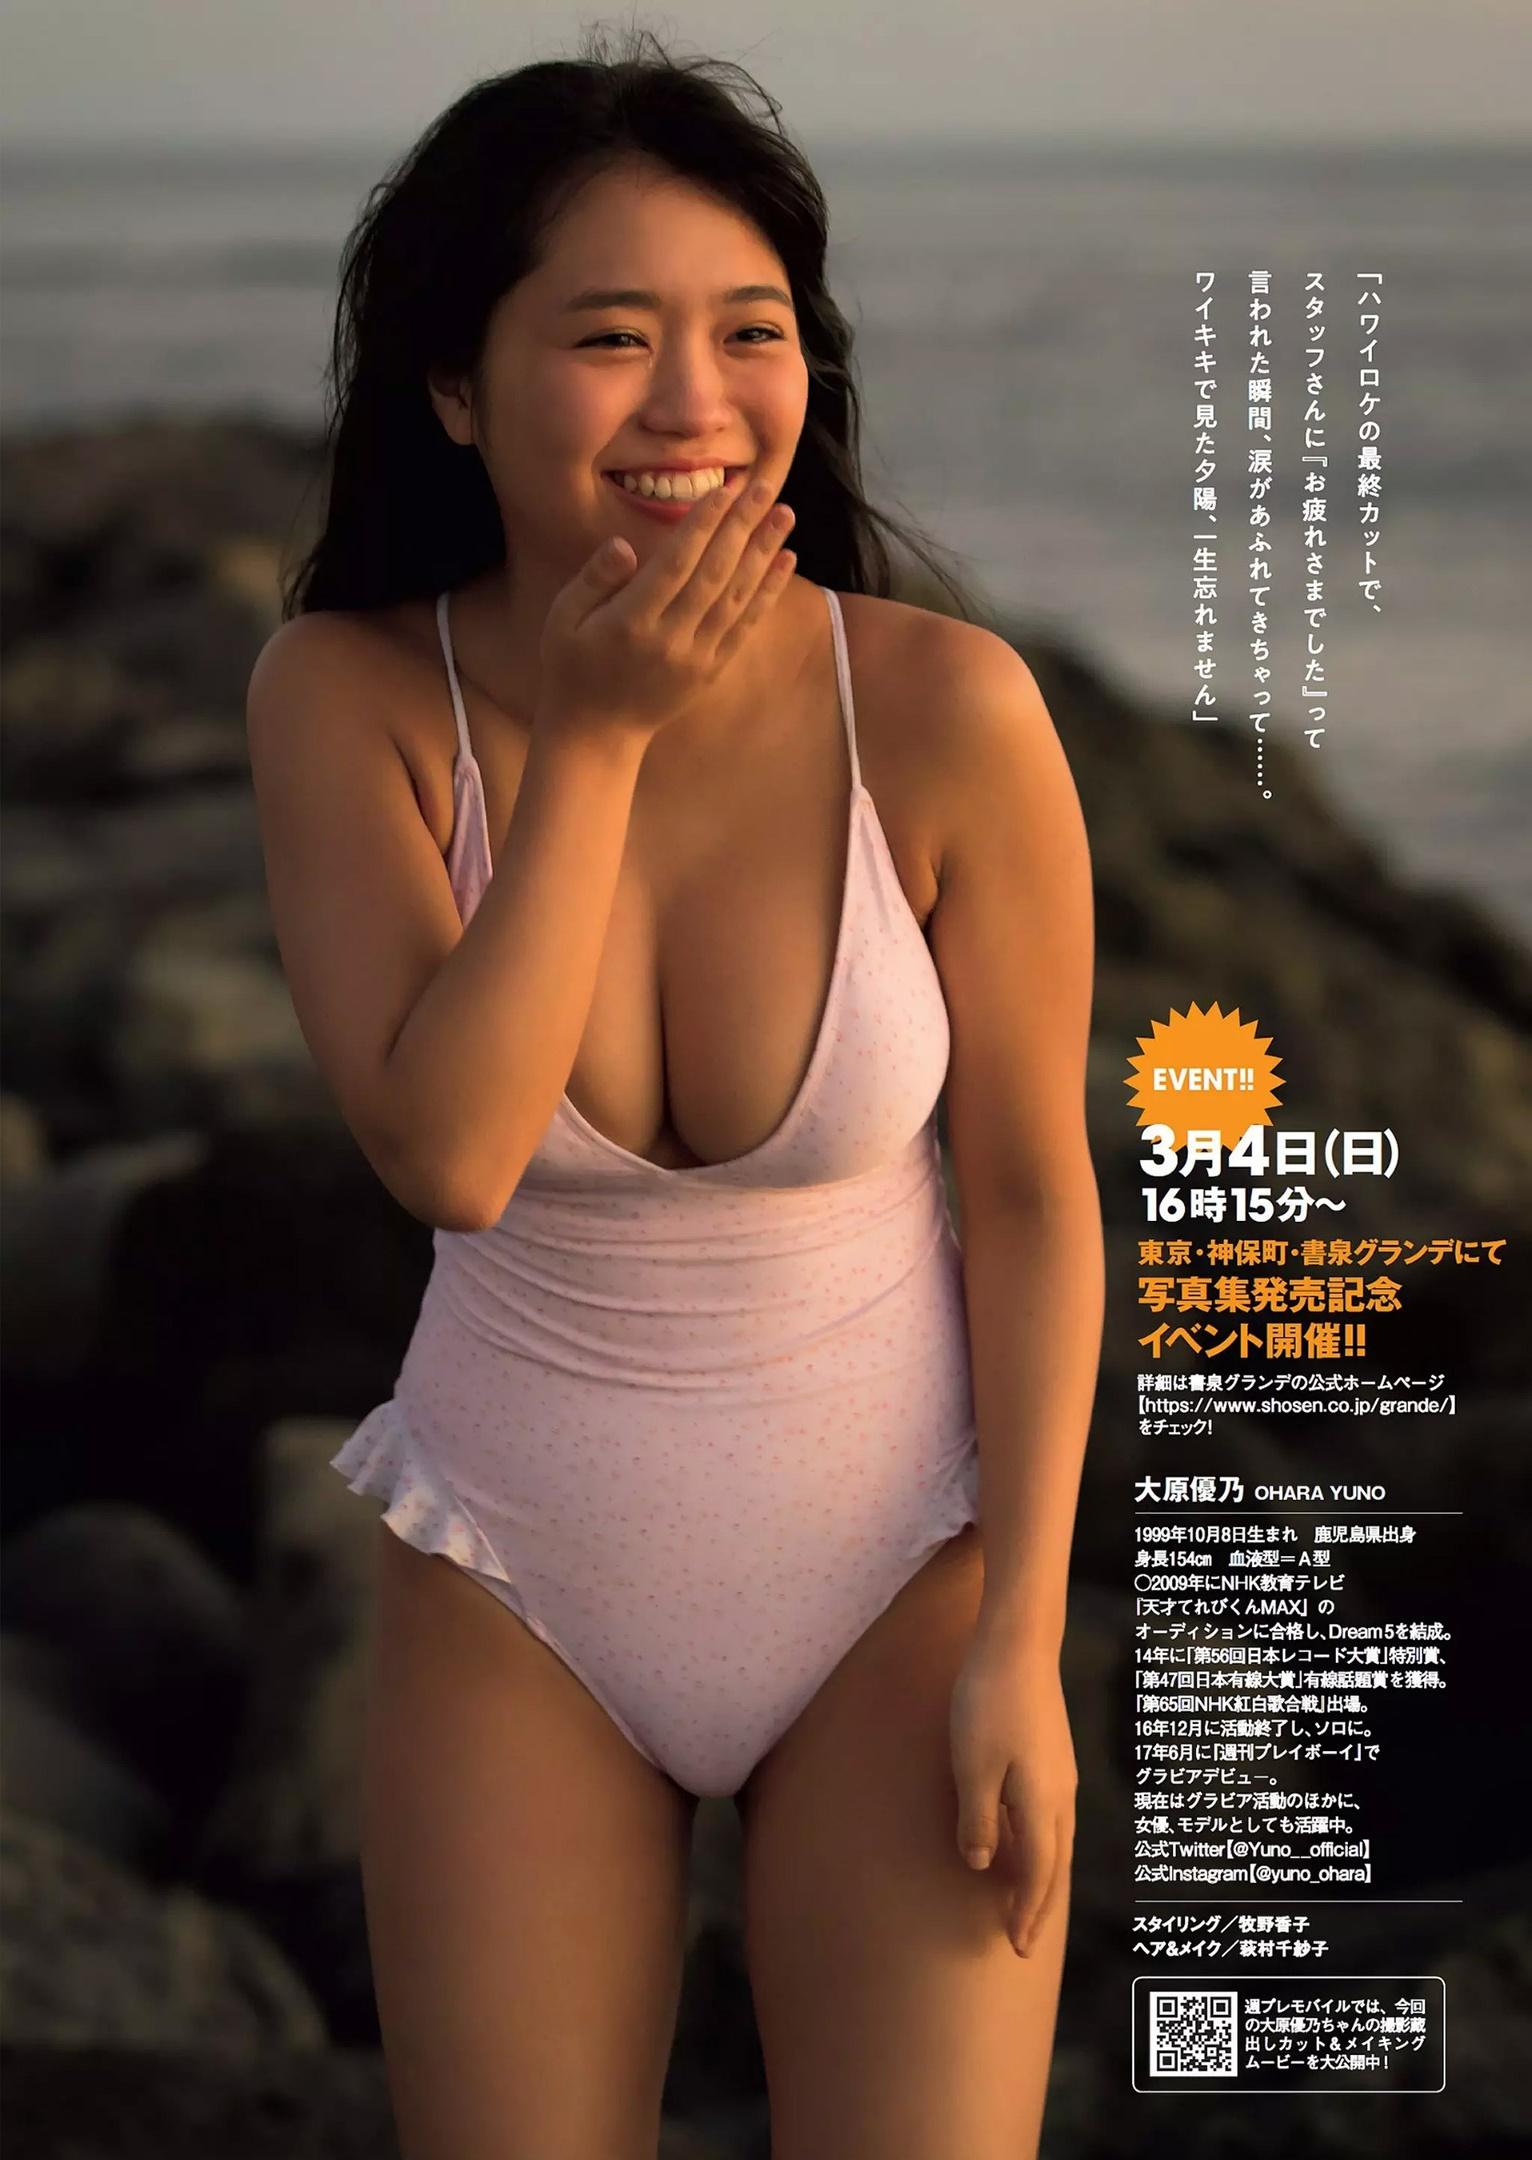 image http://scanlover.com/assets/images/71-pzDVCxjnw9N2TpUO.jpeg